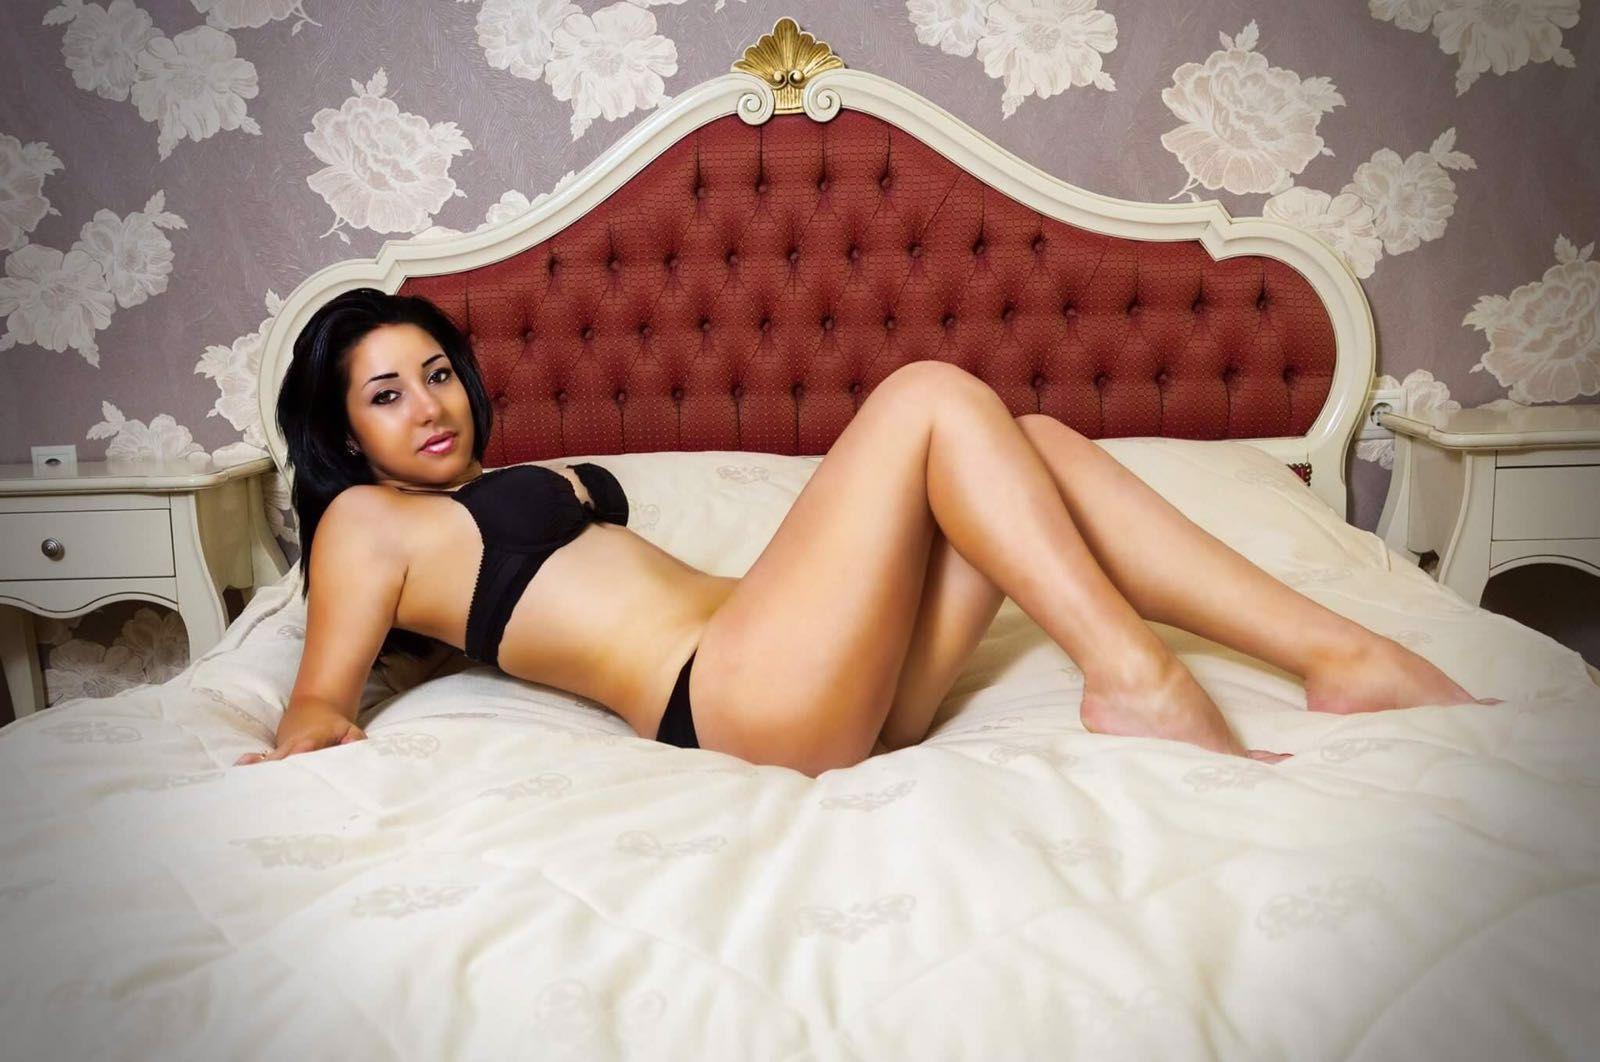 porno lady escort